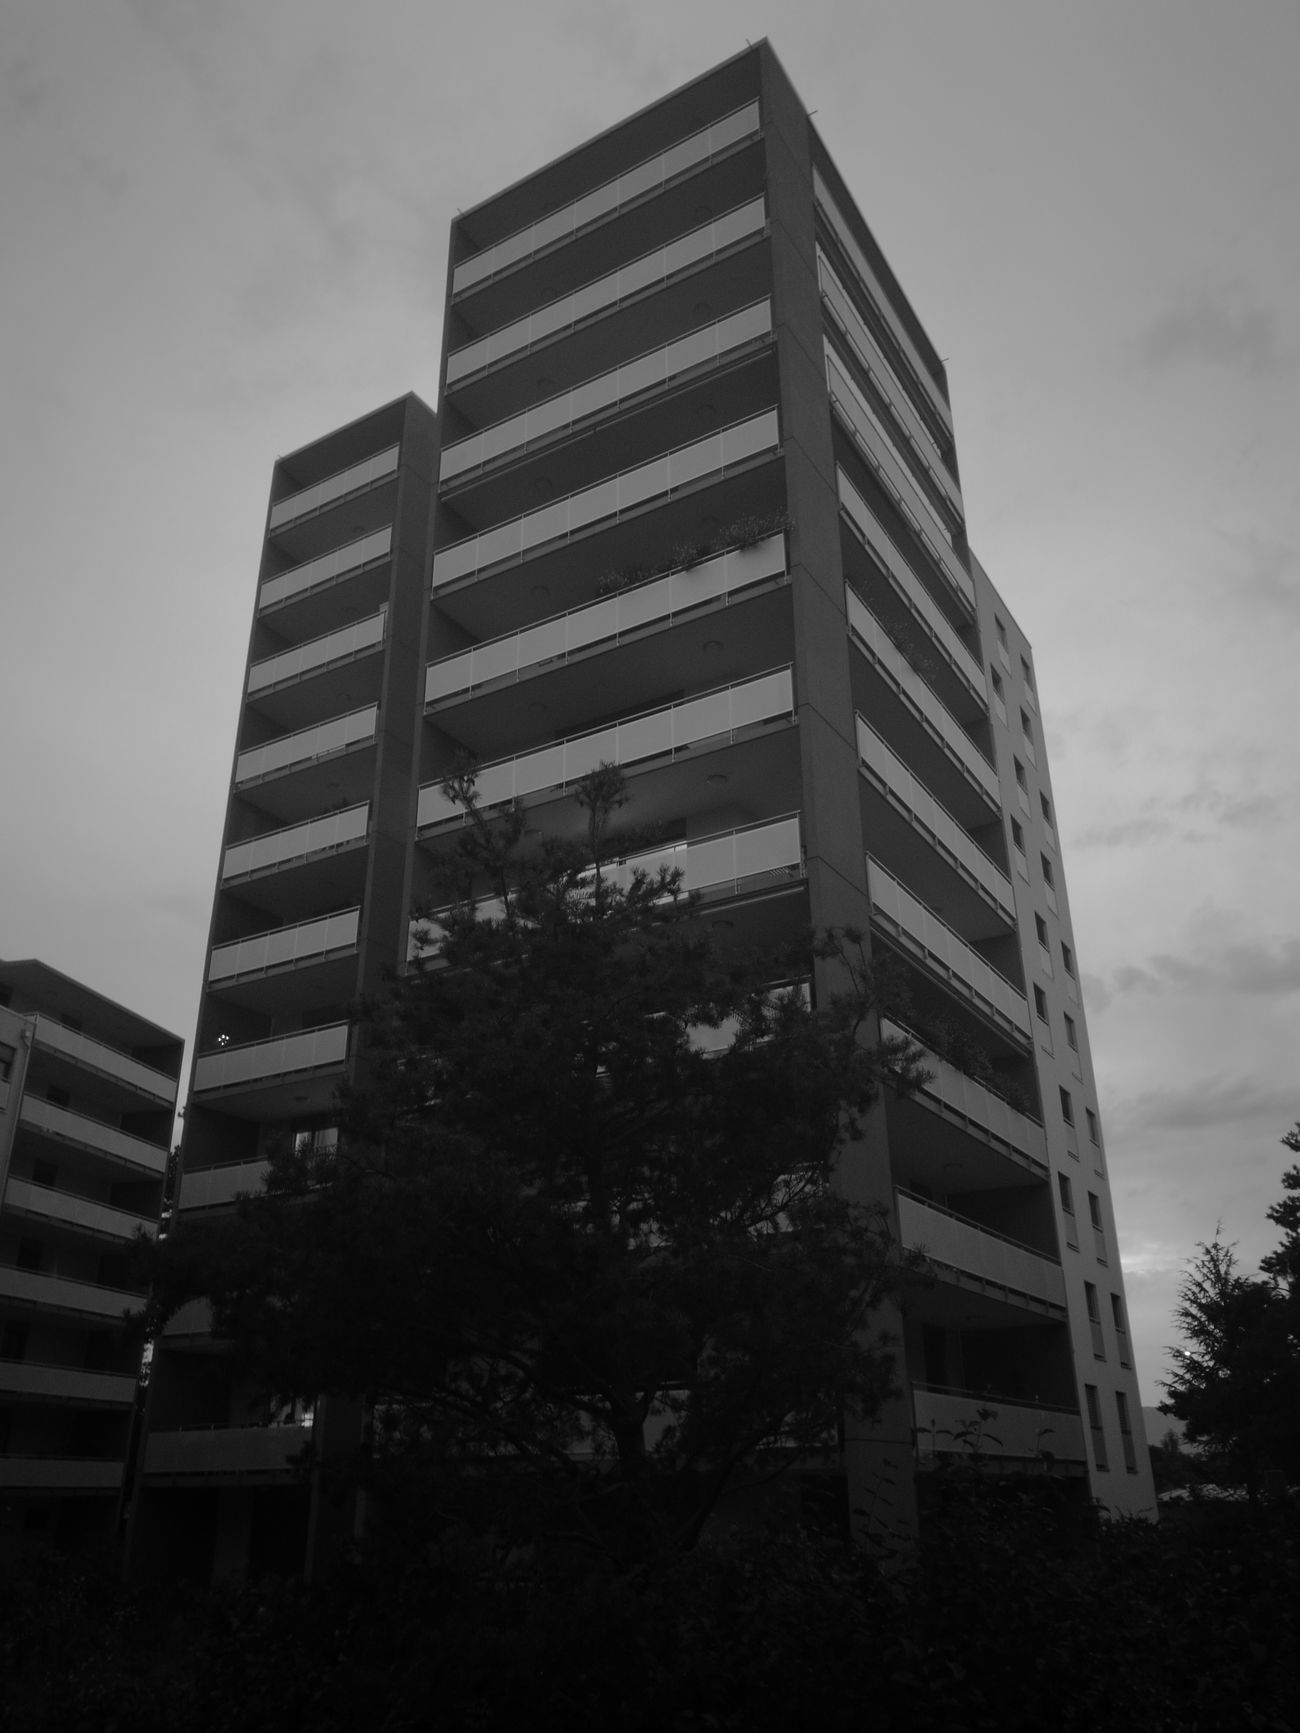 Cologny Geneva Les Cedres De Cologny Architecture